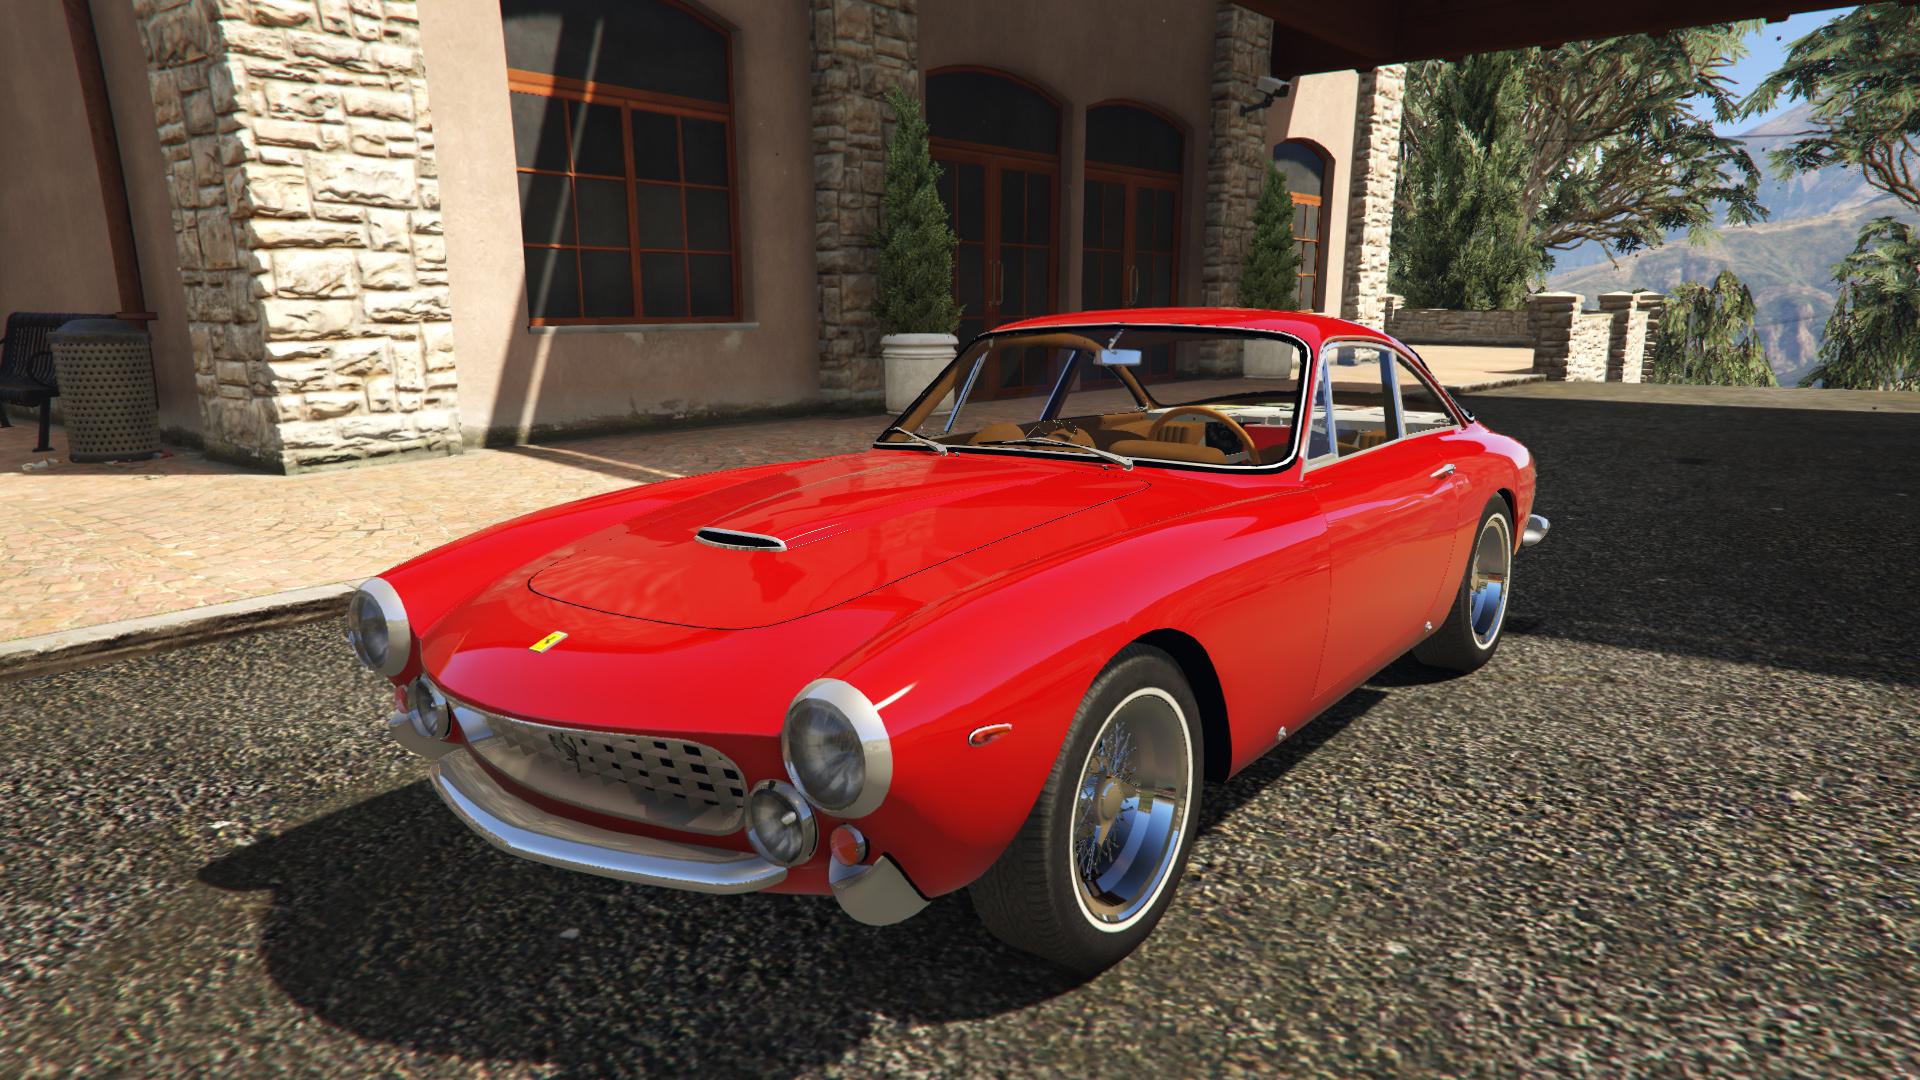 1962 Ferrari 250 GT Berlinetta Lusso - GTA5-Mods.com